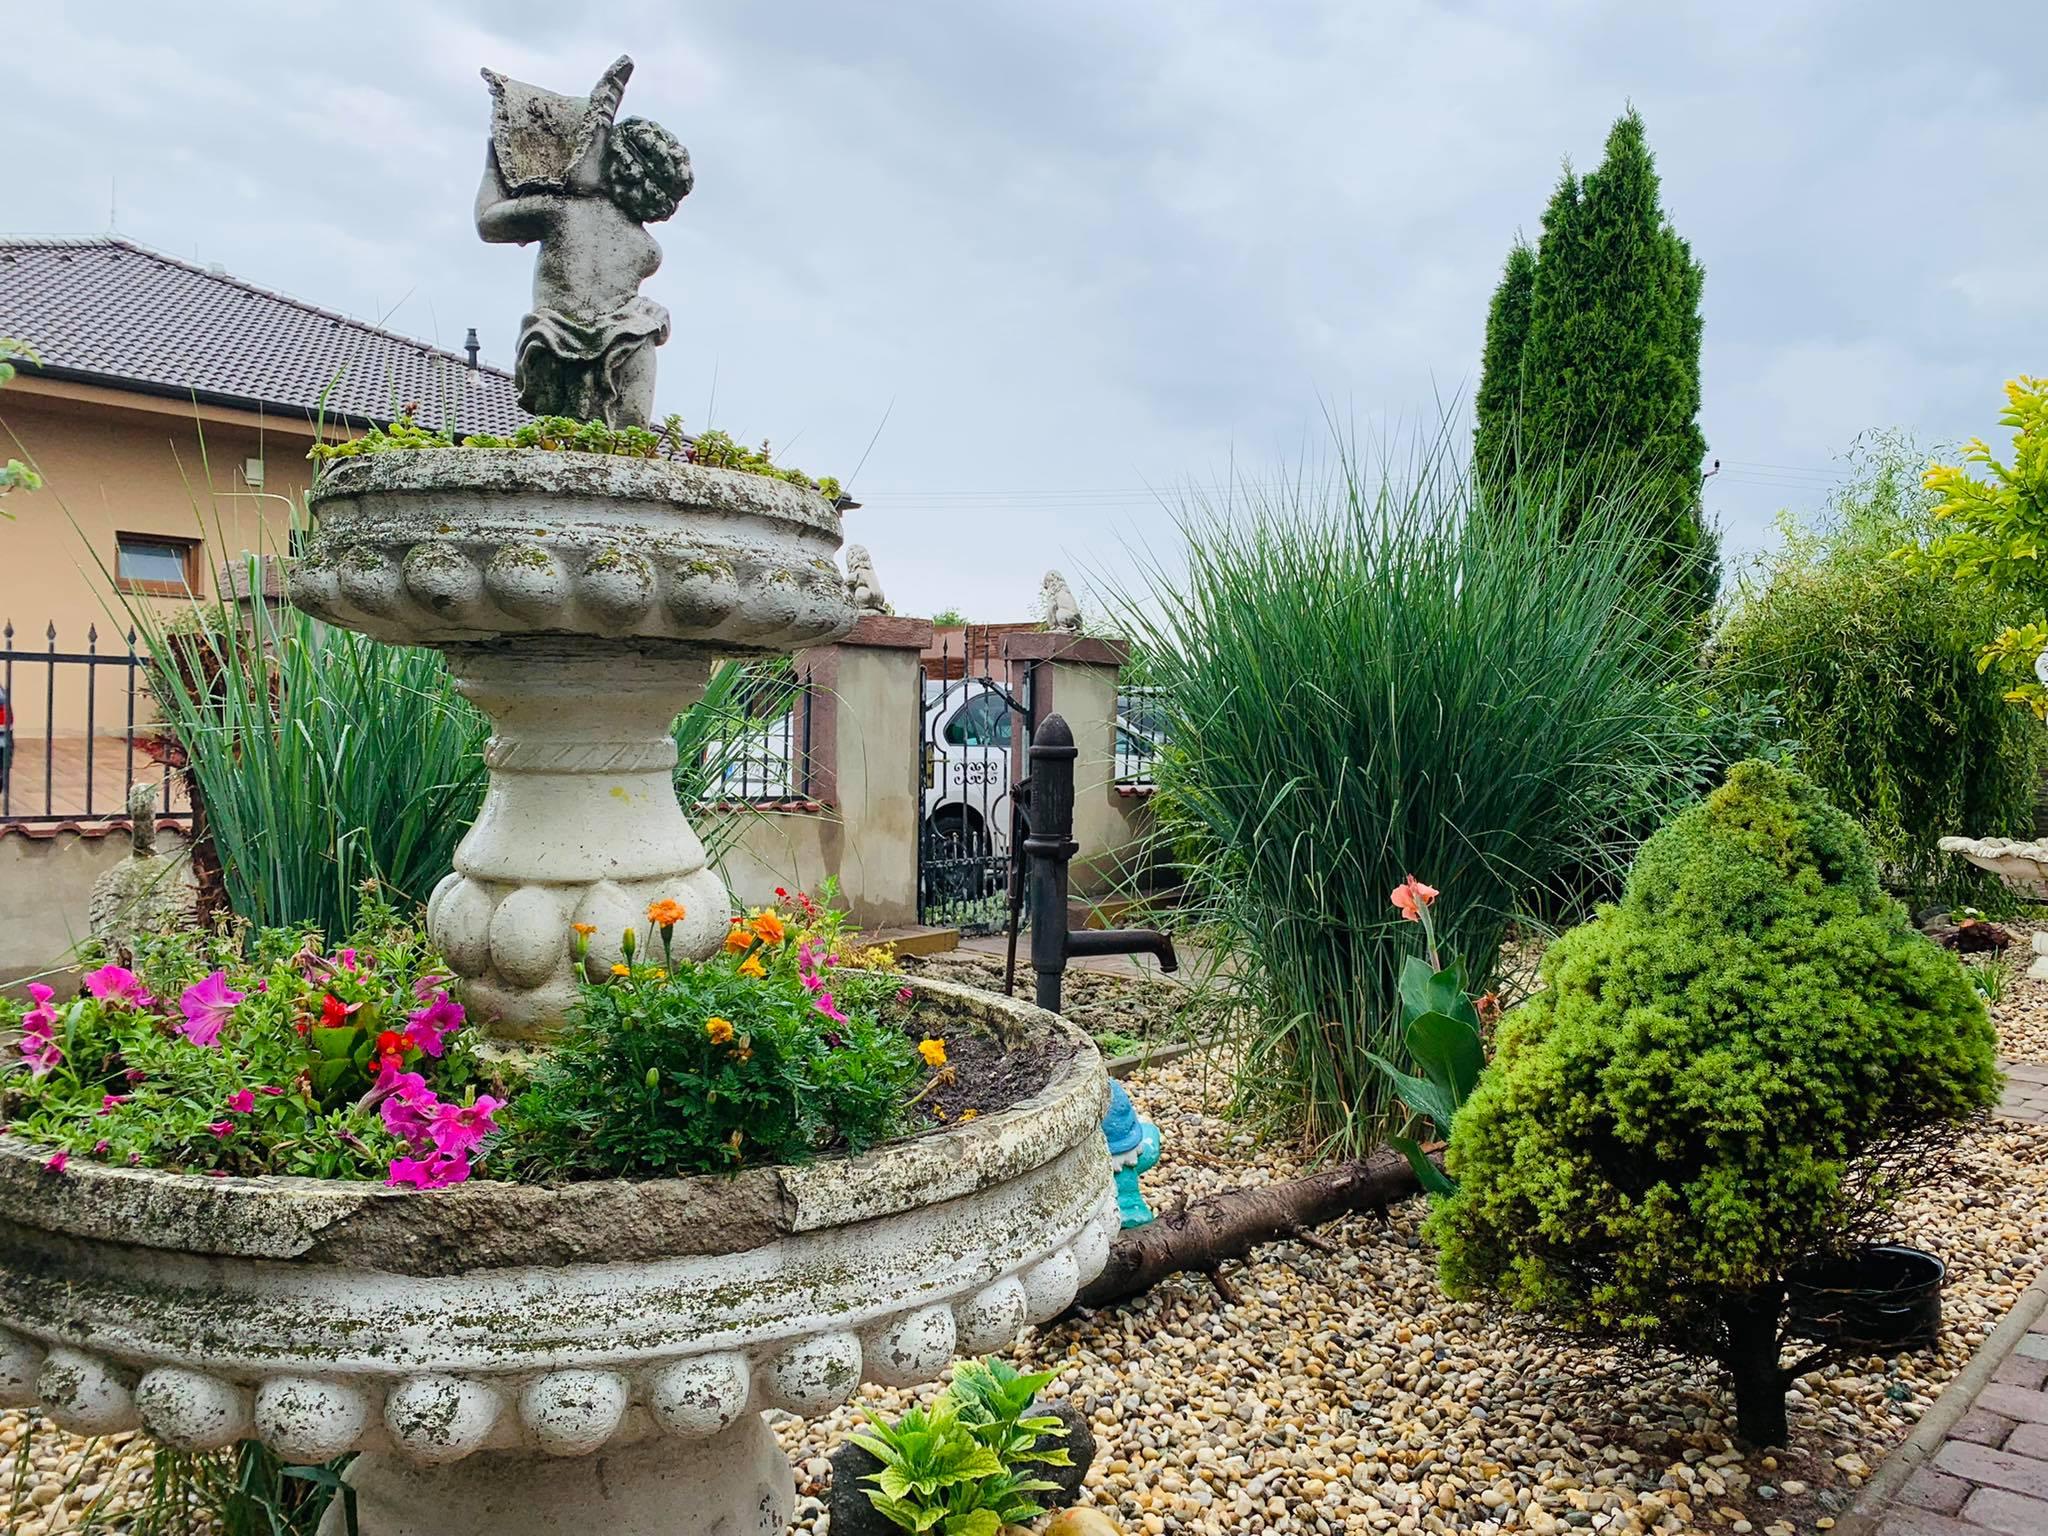 REZERVOVANÉ!| Krajný rodinný dom | pozemok 412 m2 | klimatizovaný | SENEC |